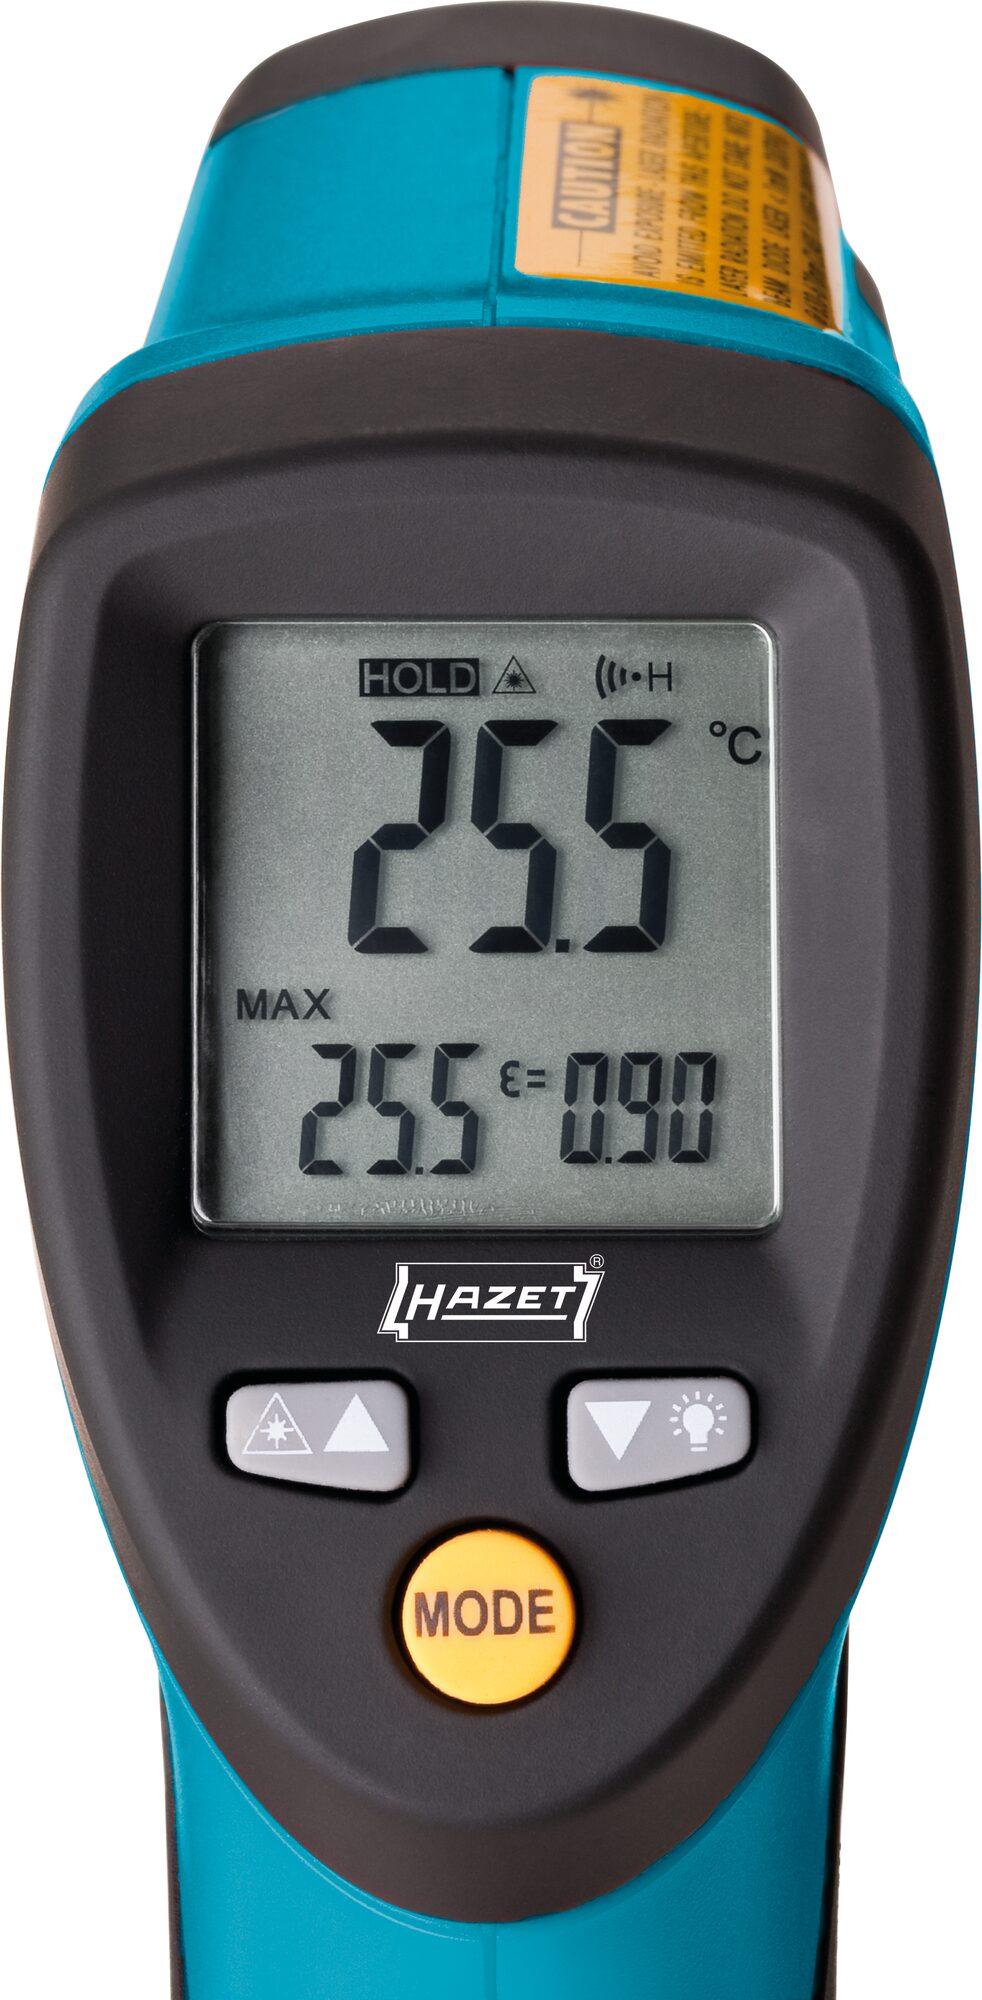 HAZET Infrarot-Thermometer 1991-1